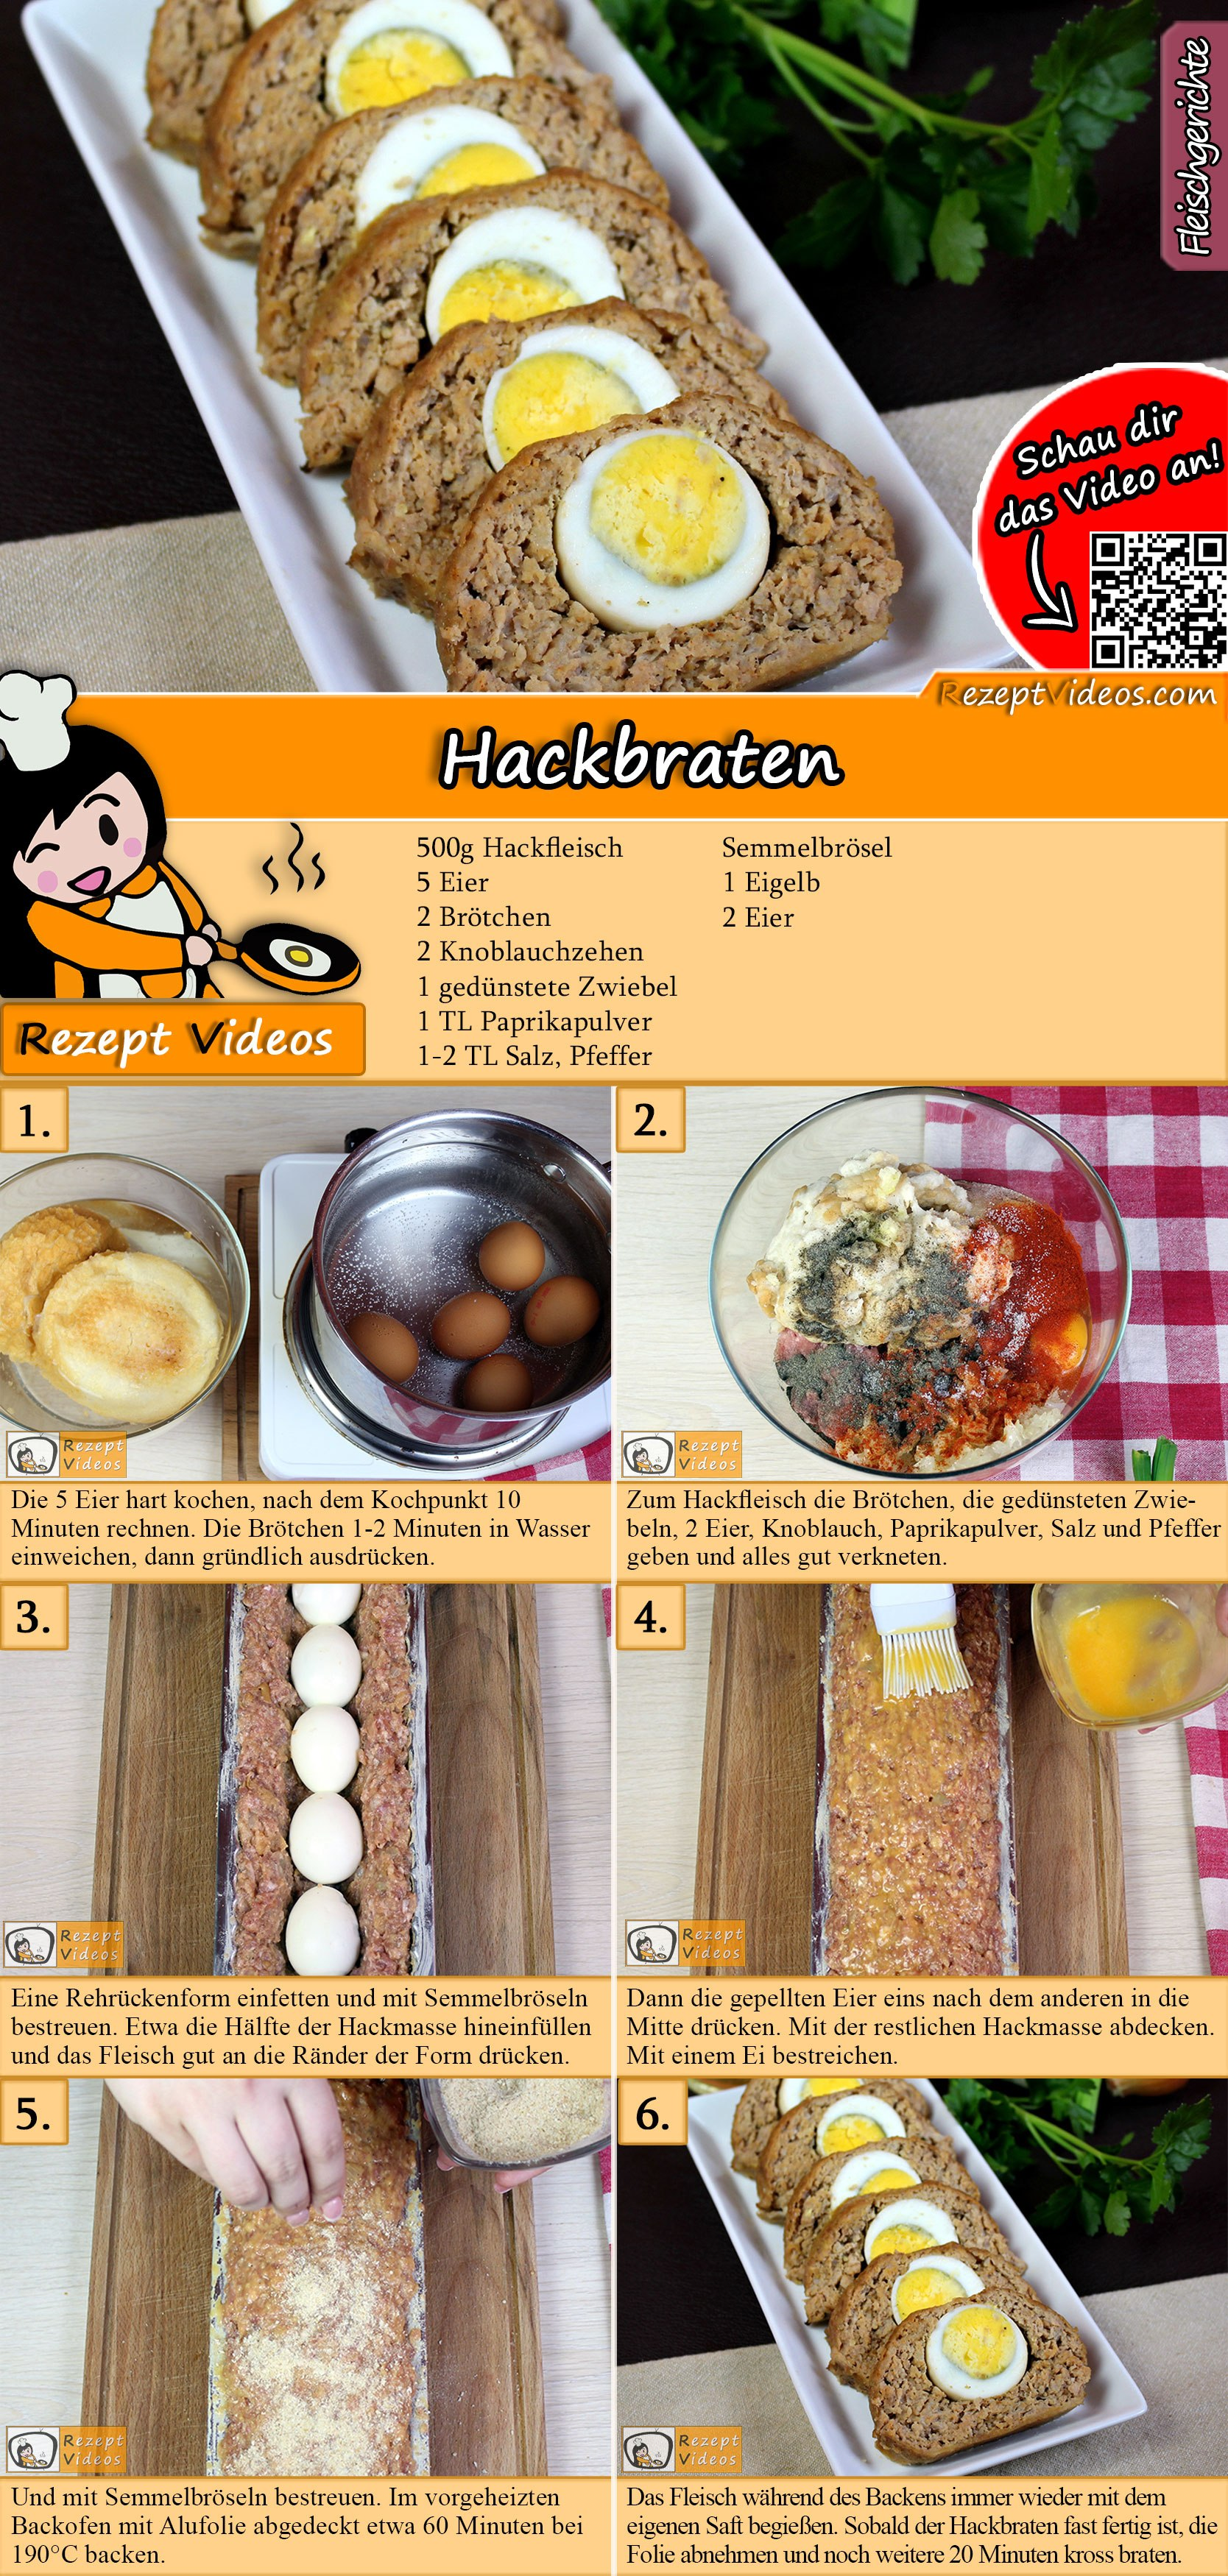 Hackbraten Rezept mit Video